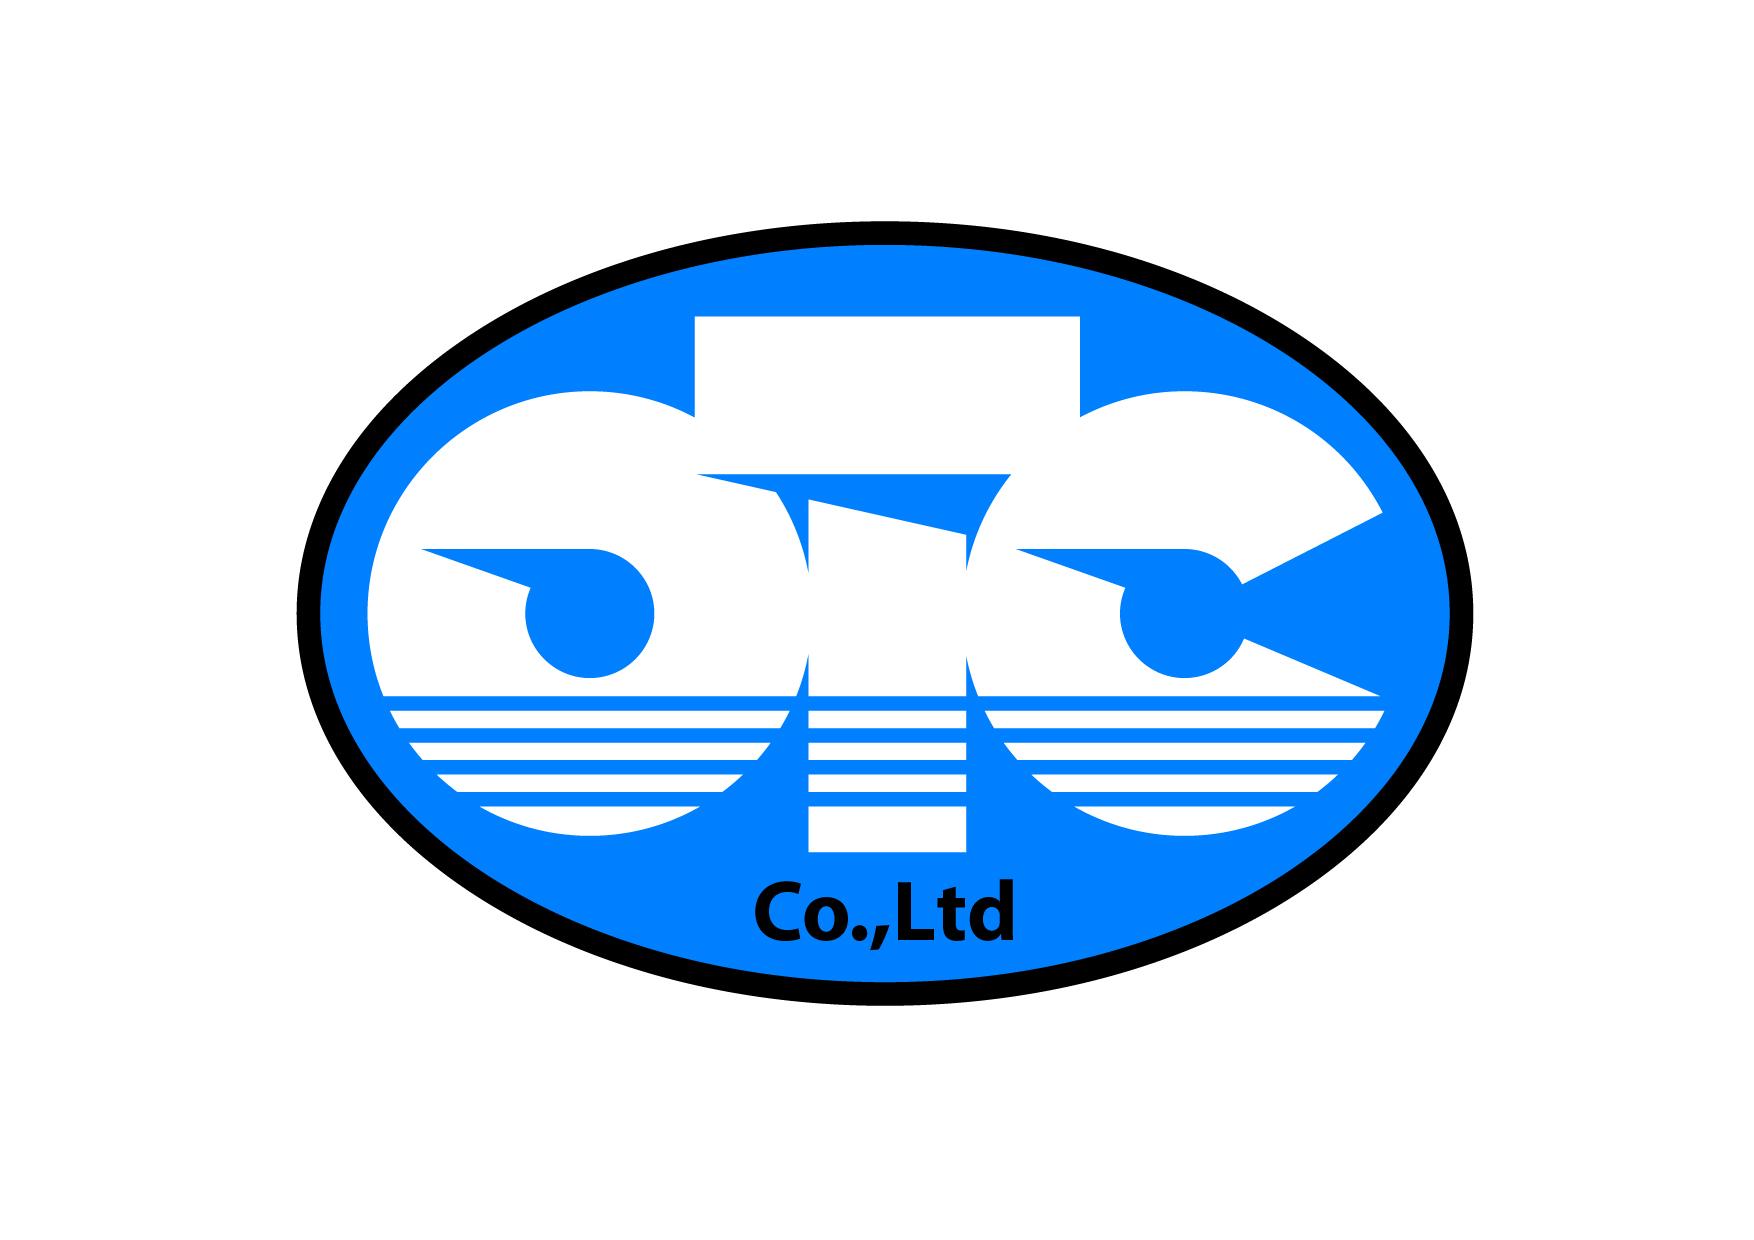 Logo Design by Wilfredo Mendoza - Entry No. 131 in the Logo Design Contest Unique Logo Design Wanted for OTC Co.,Ltd..